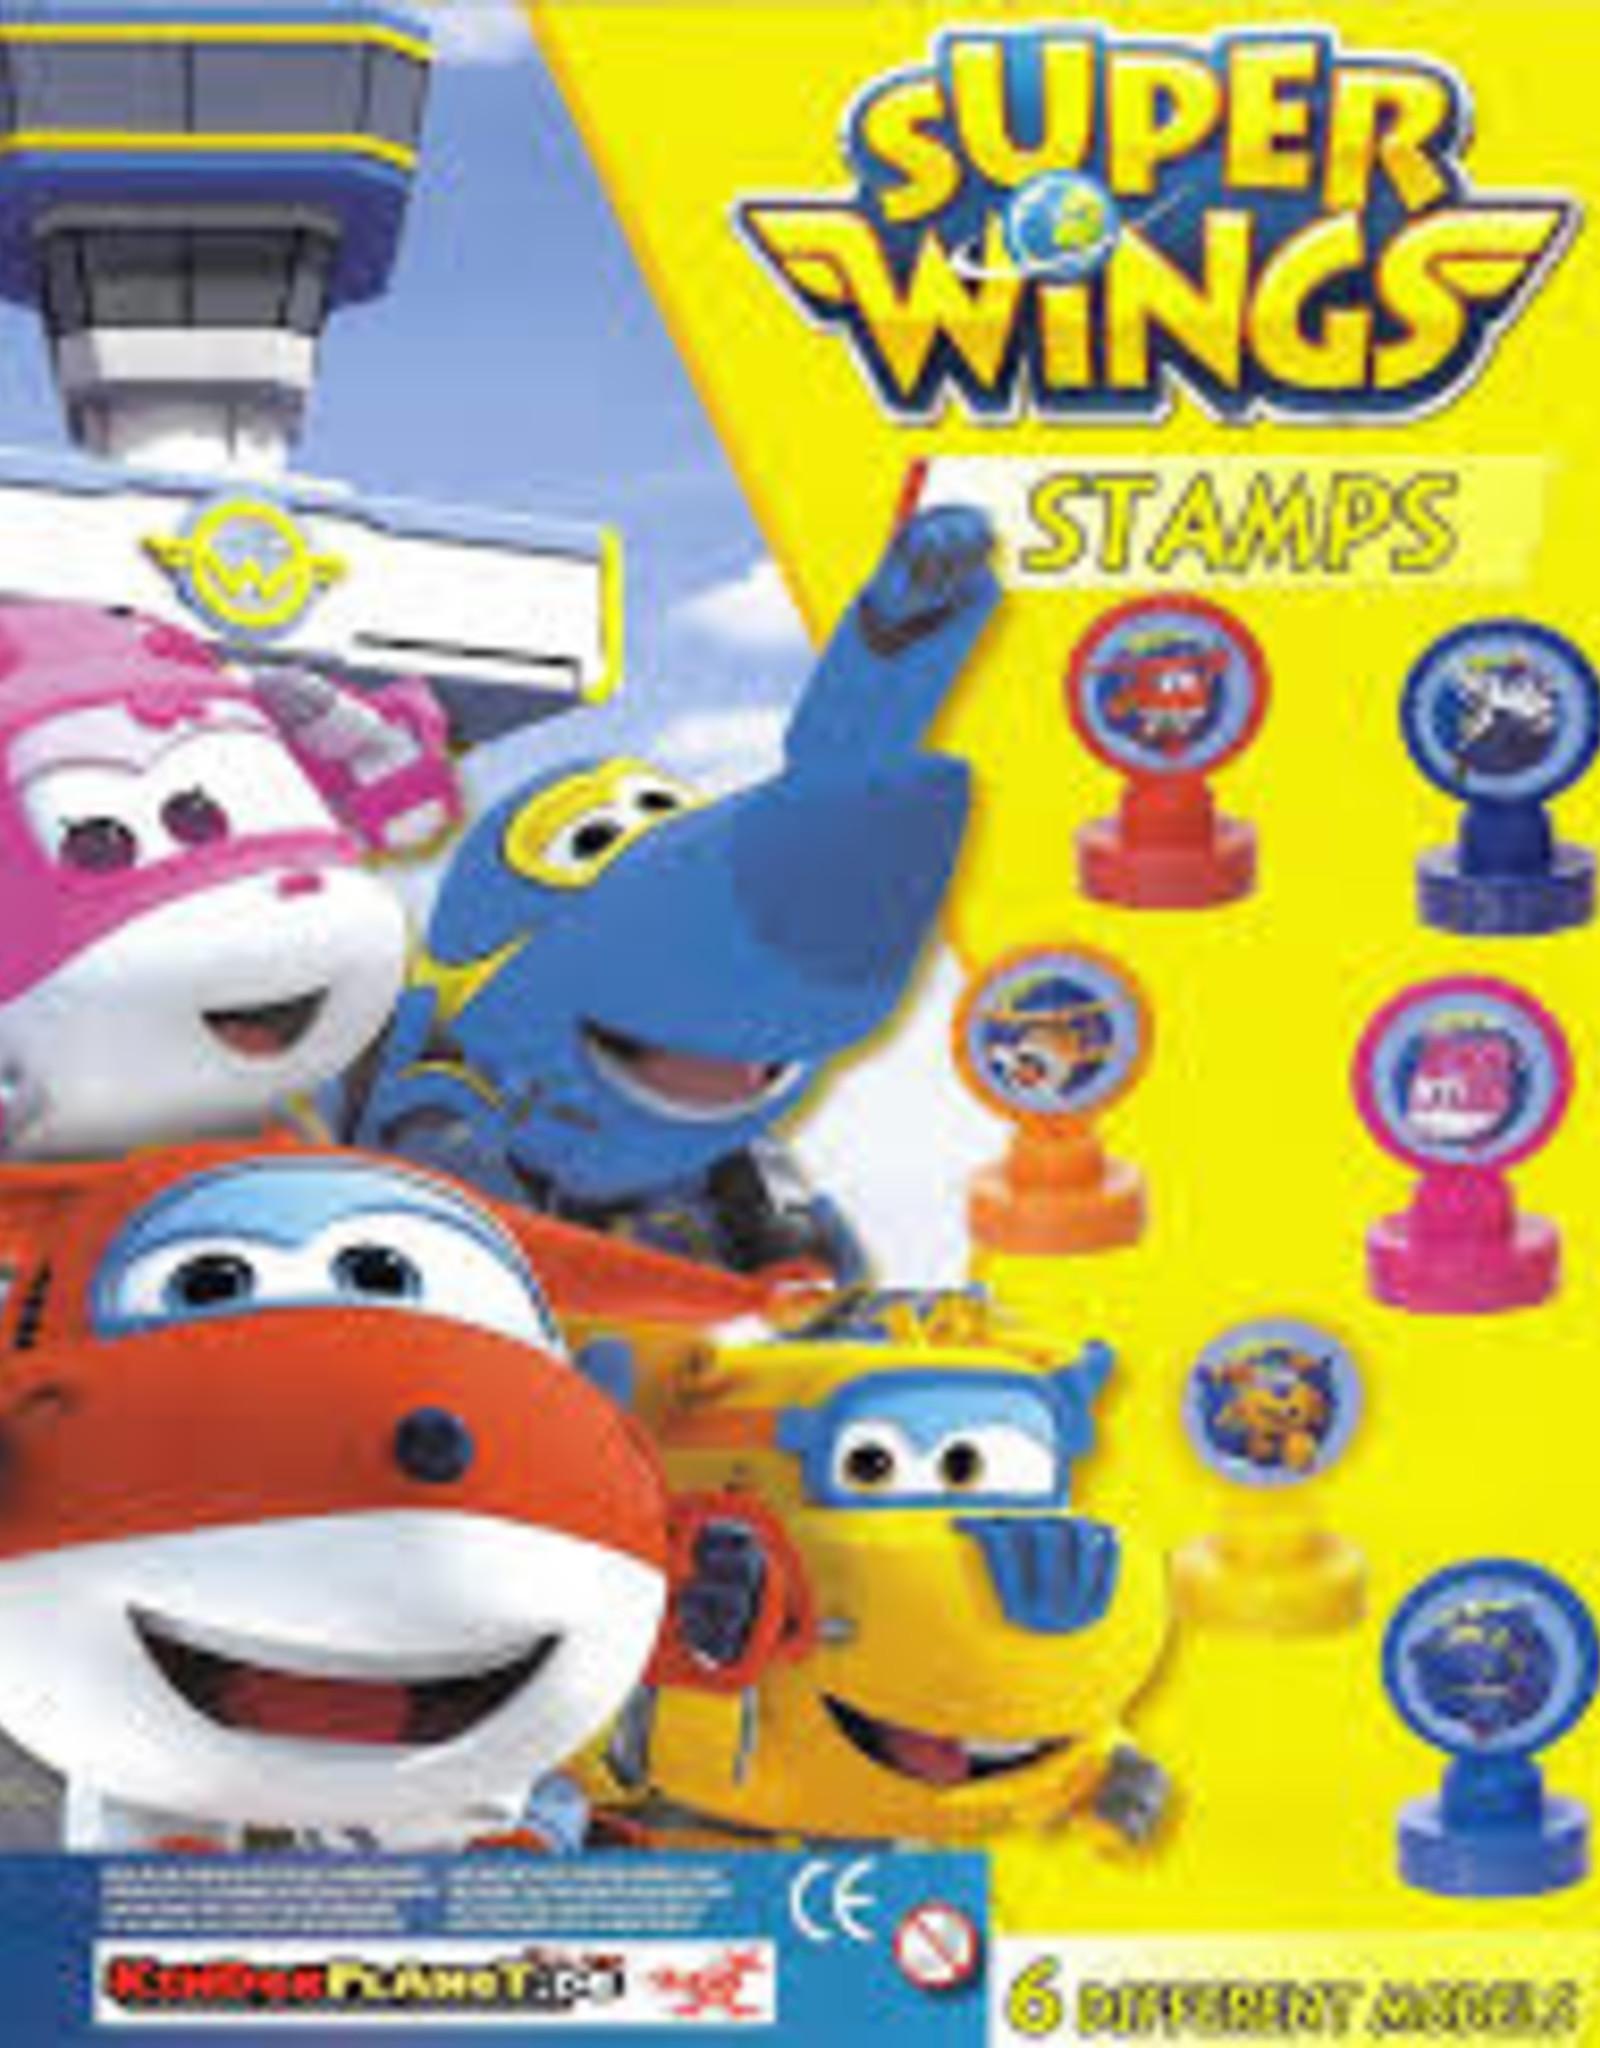 Superwings Stempels